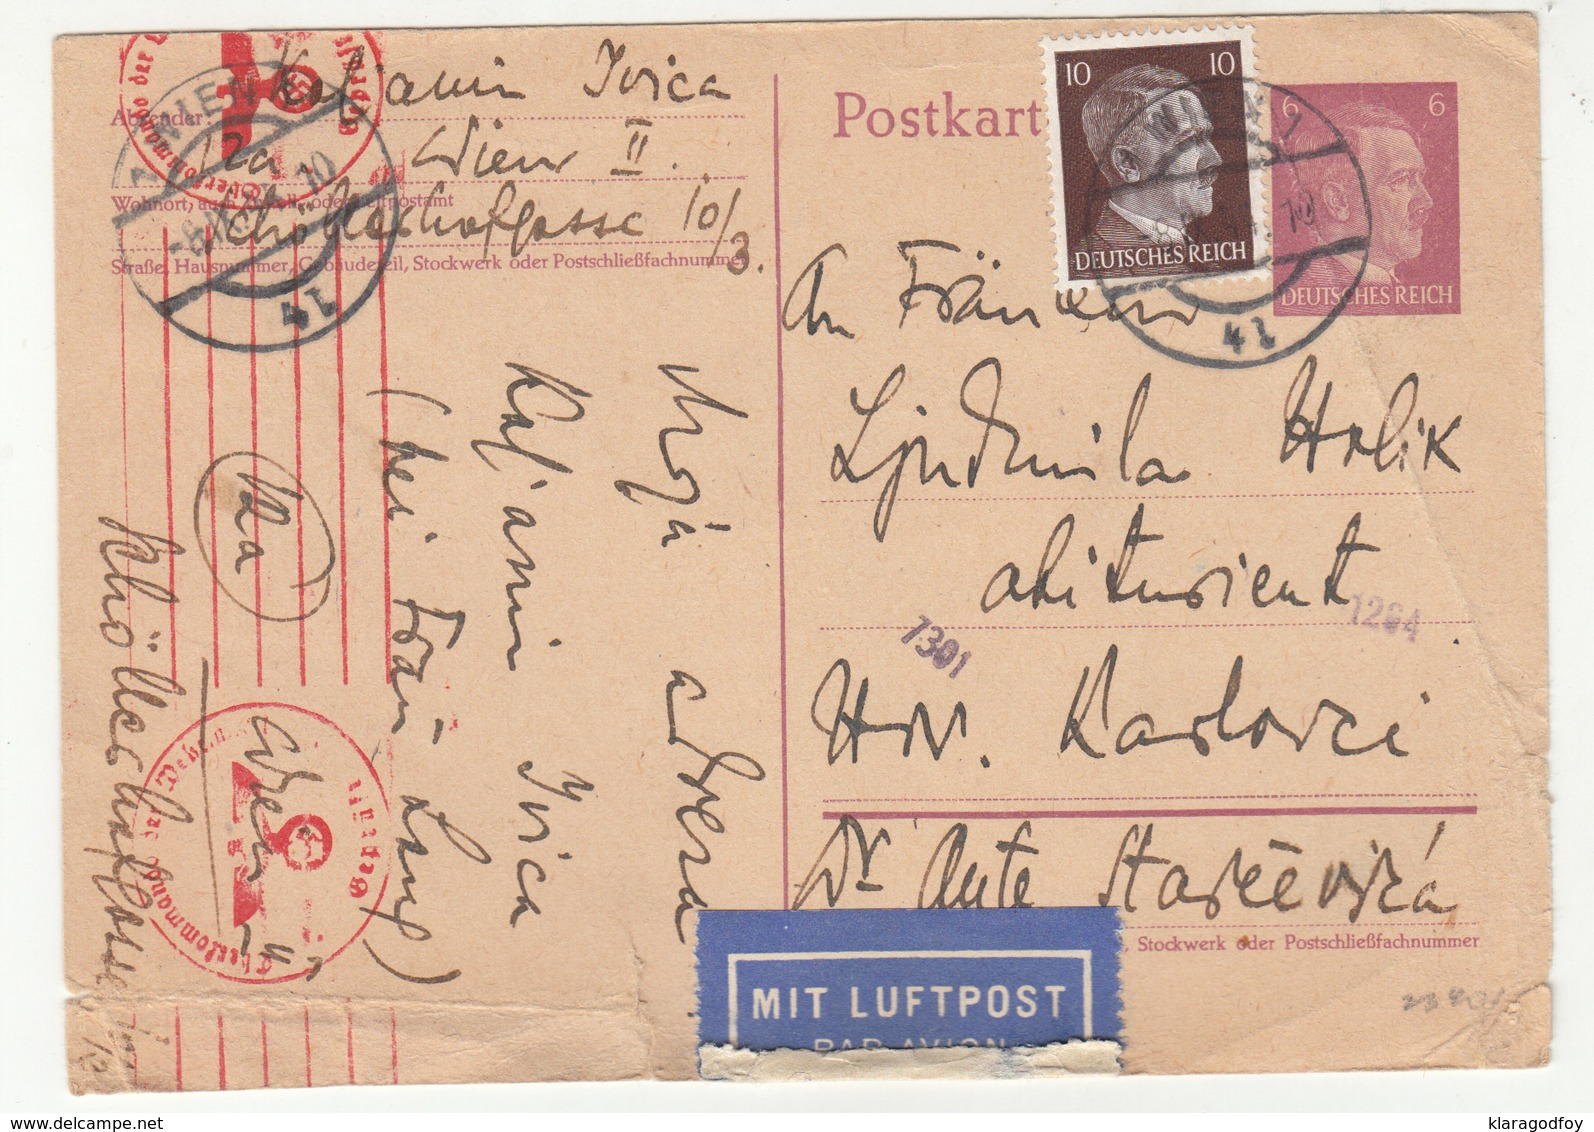 Germany Reich Postal Stationery Postcard Travelled 1944 Air Mail Wien To Hrvatski Karlovci Censored B190720 - Deutschland